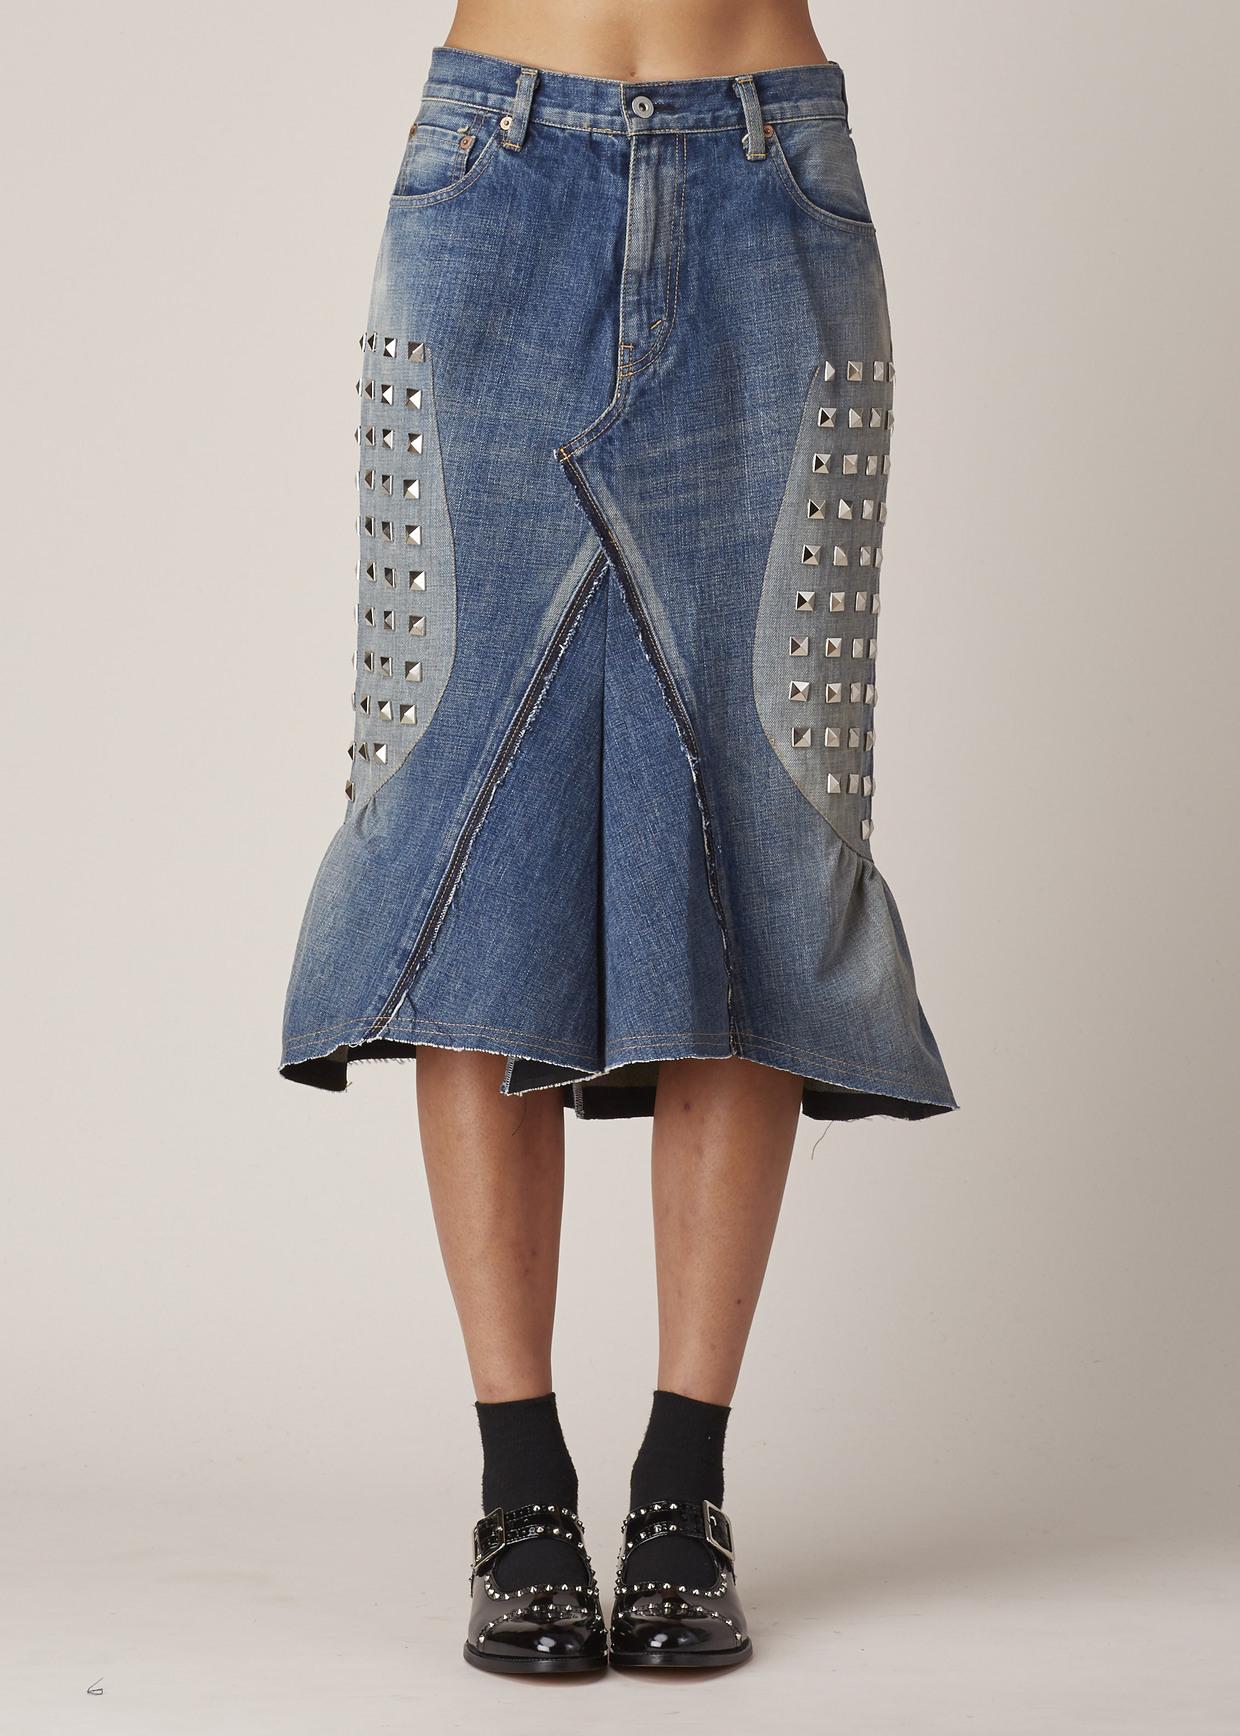 junya watanabe indigo studded denim skirt in blue lyst